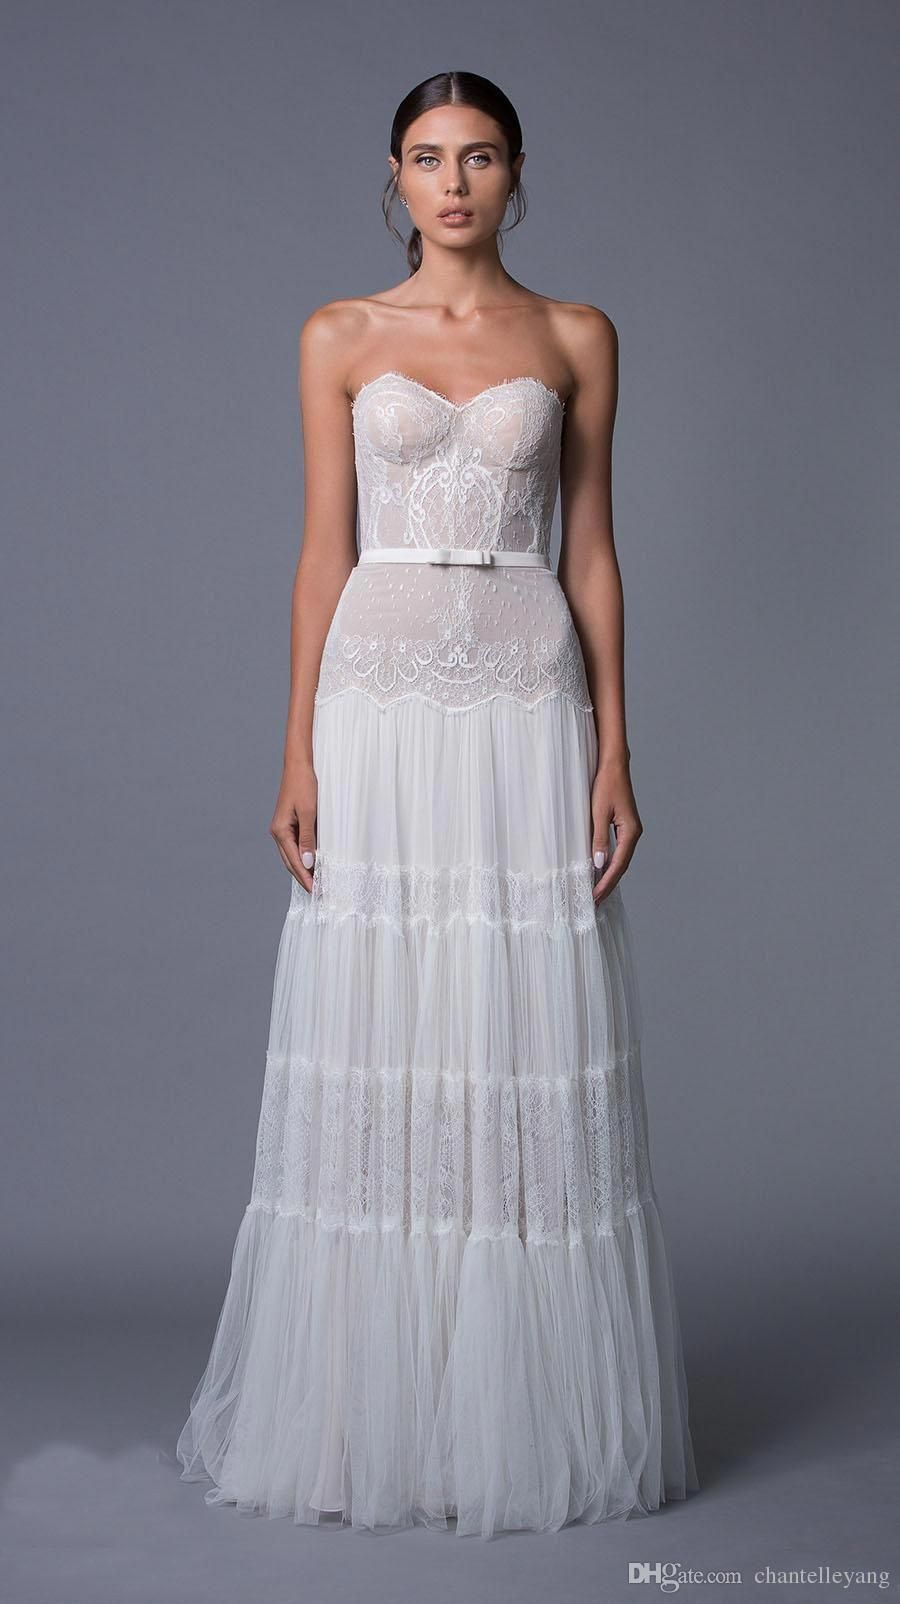 Wholesale Black Wedding Dress Bridal Stores And Bride Dress On